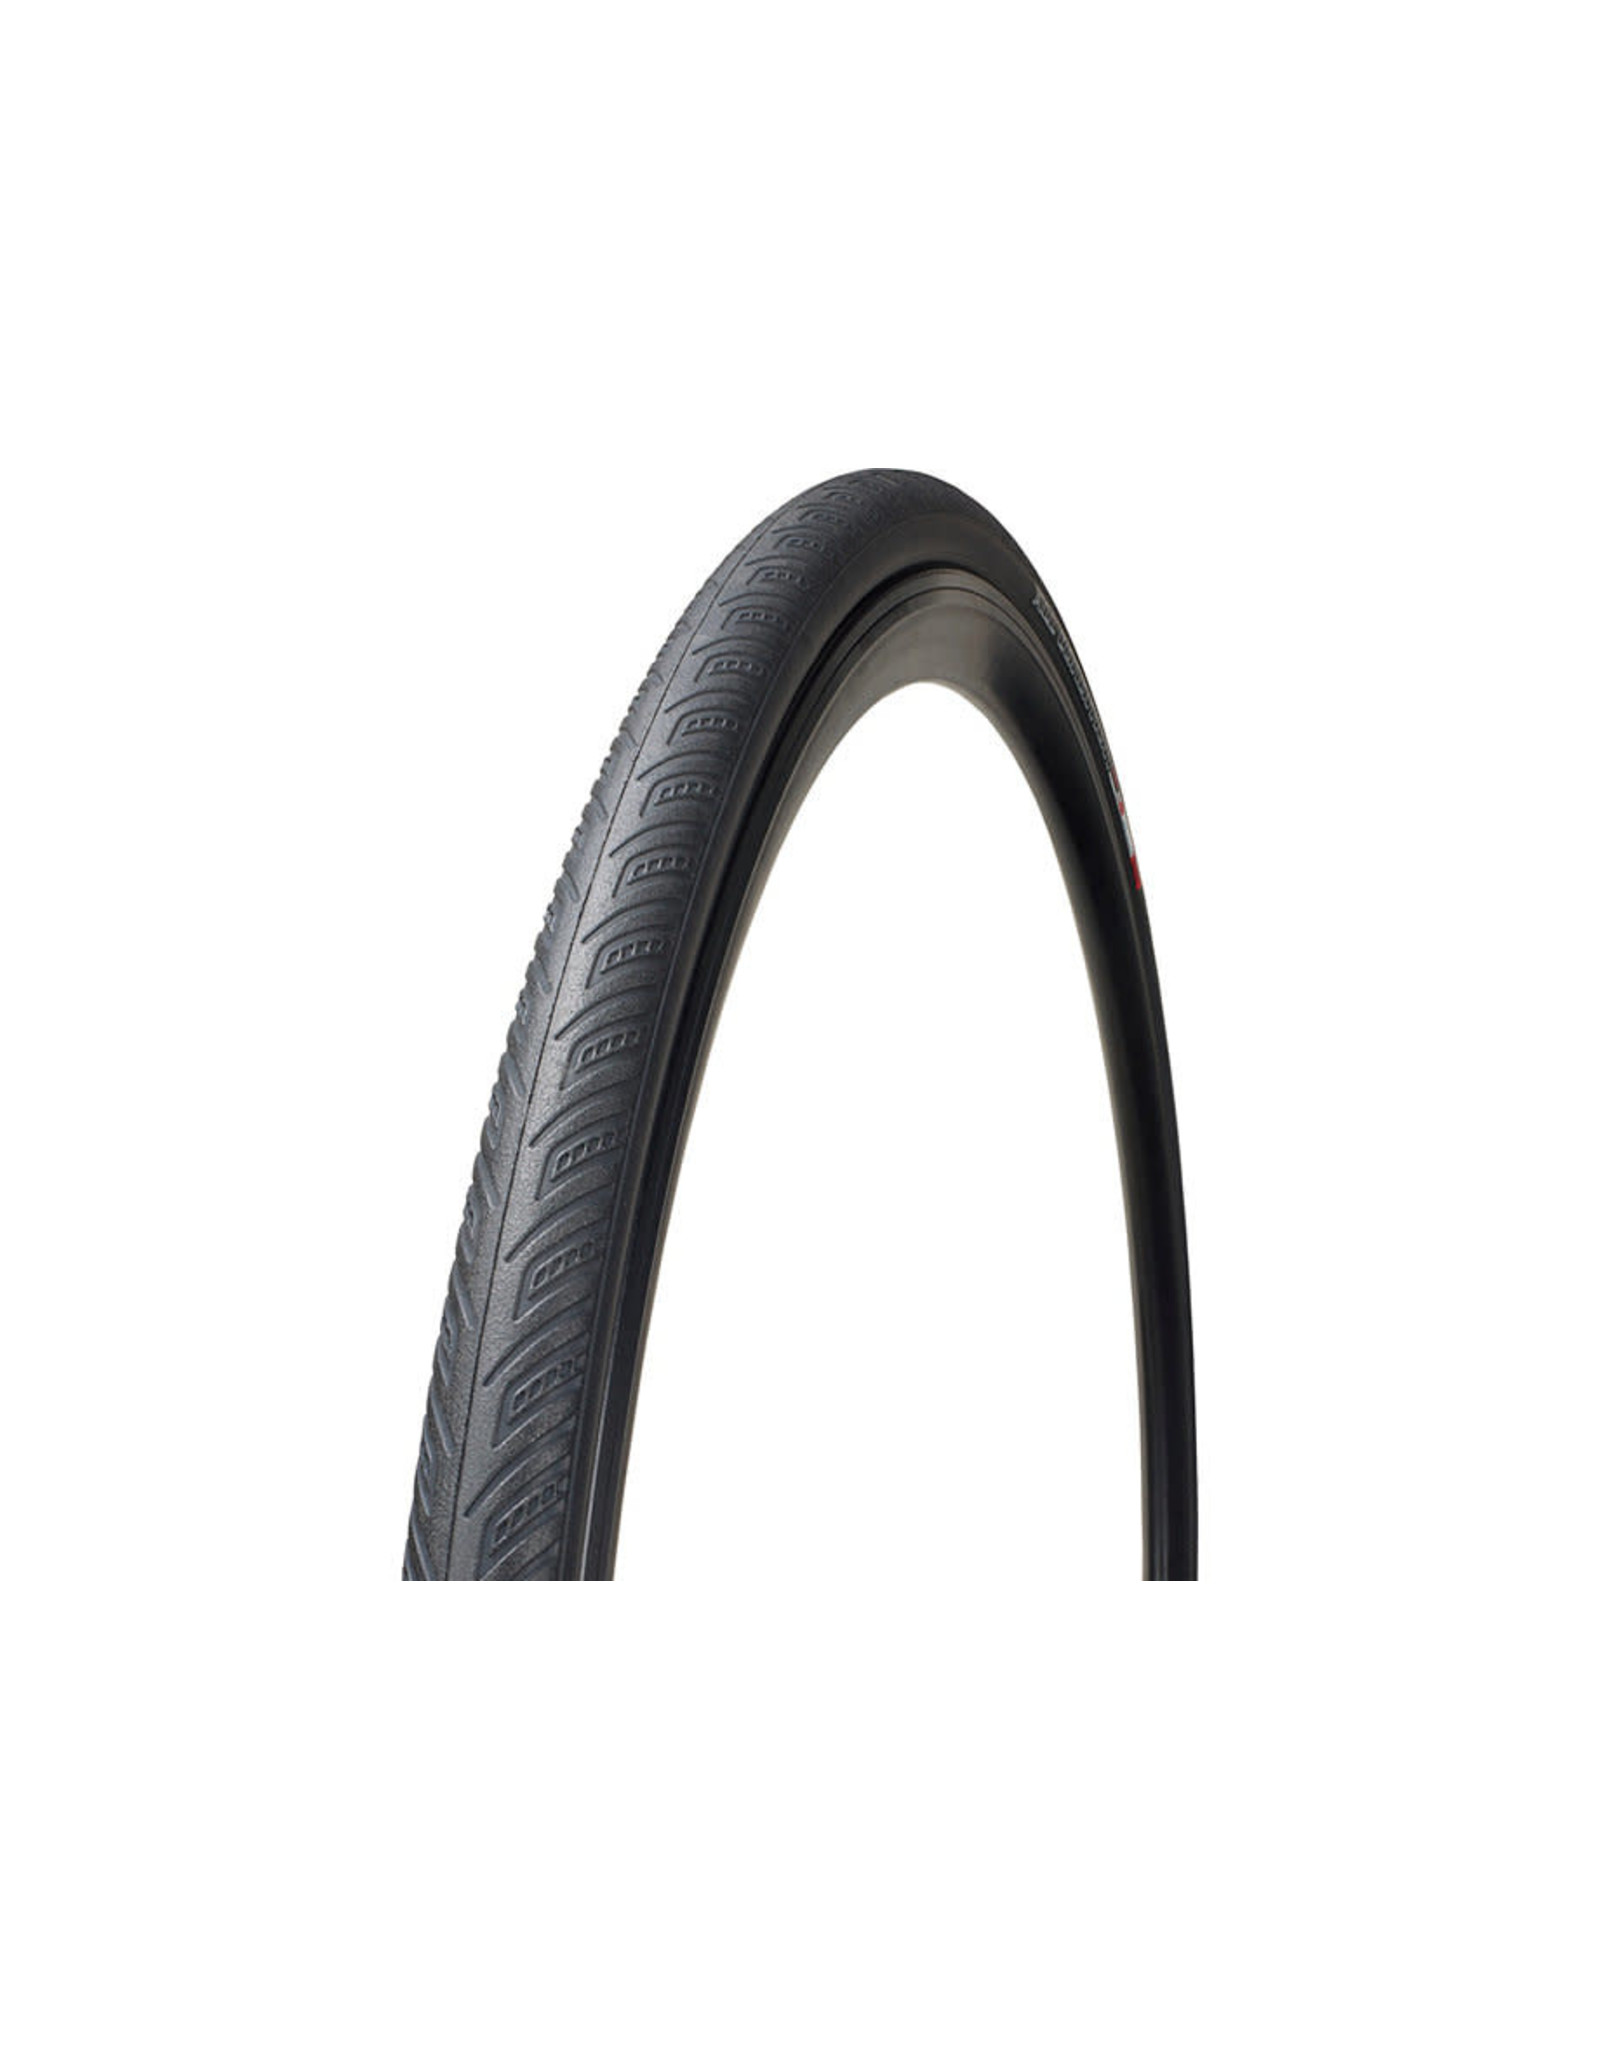 Specialized Specialized All Condition Armadillo Elite Tire 700x25